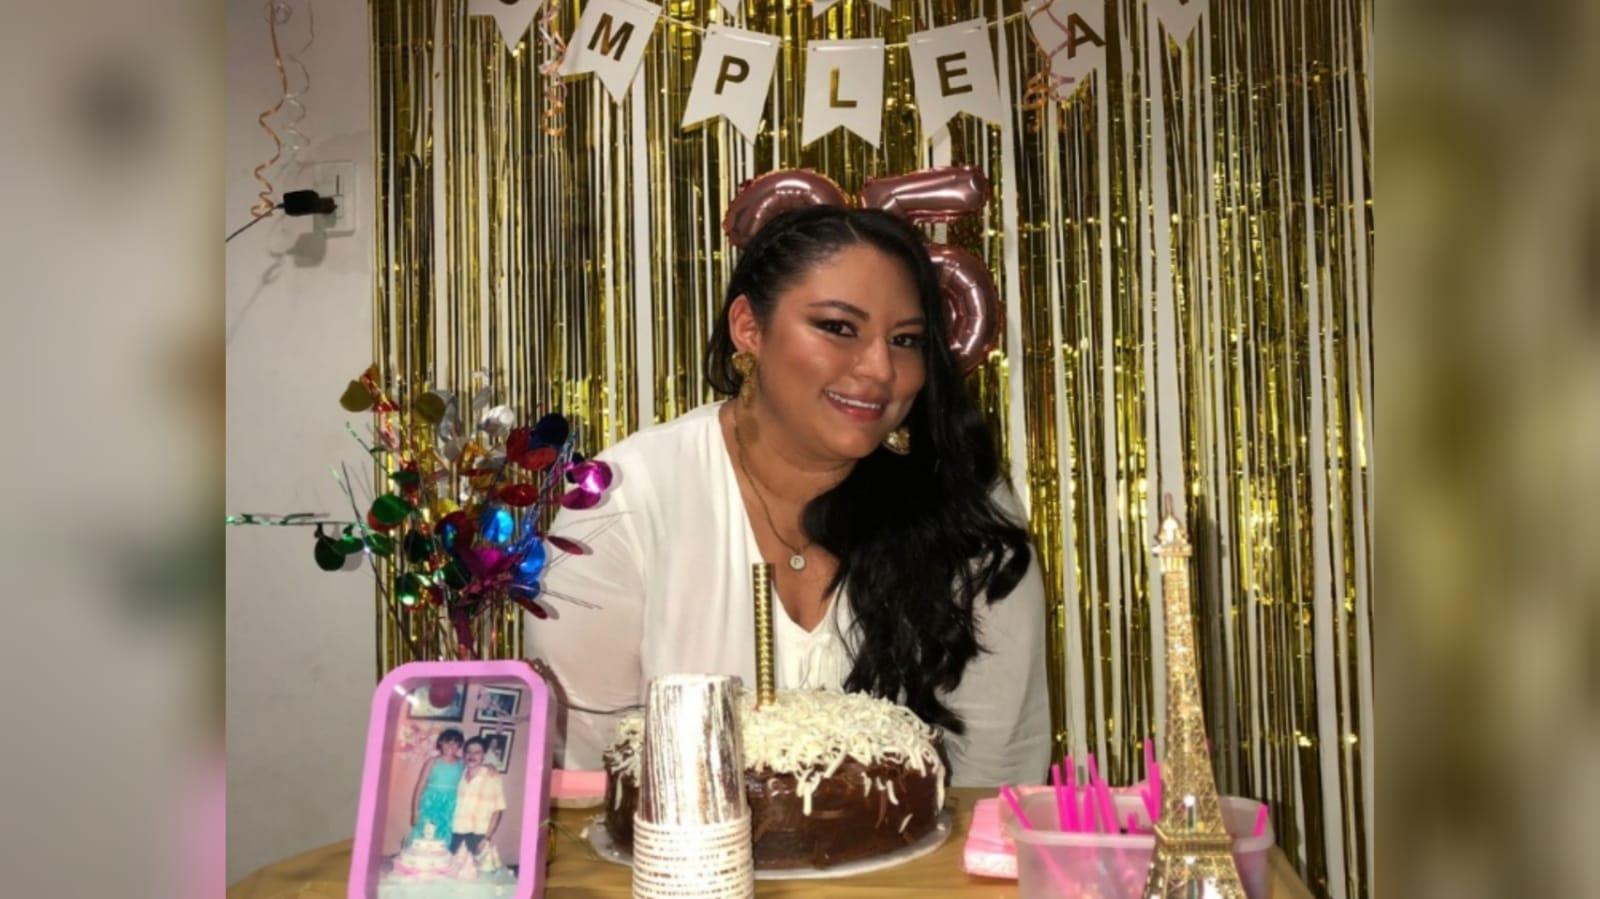 Cumpleaños de Pilar